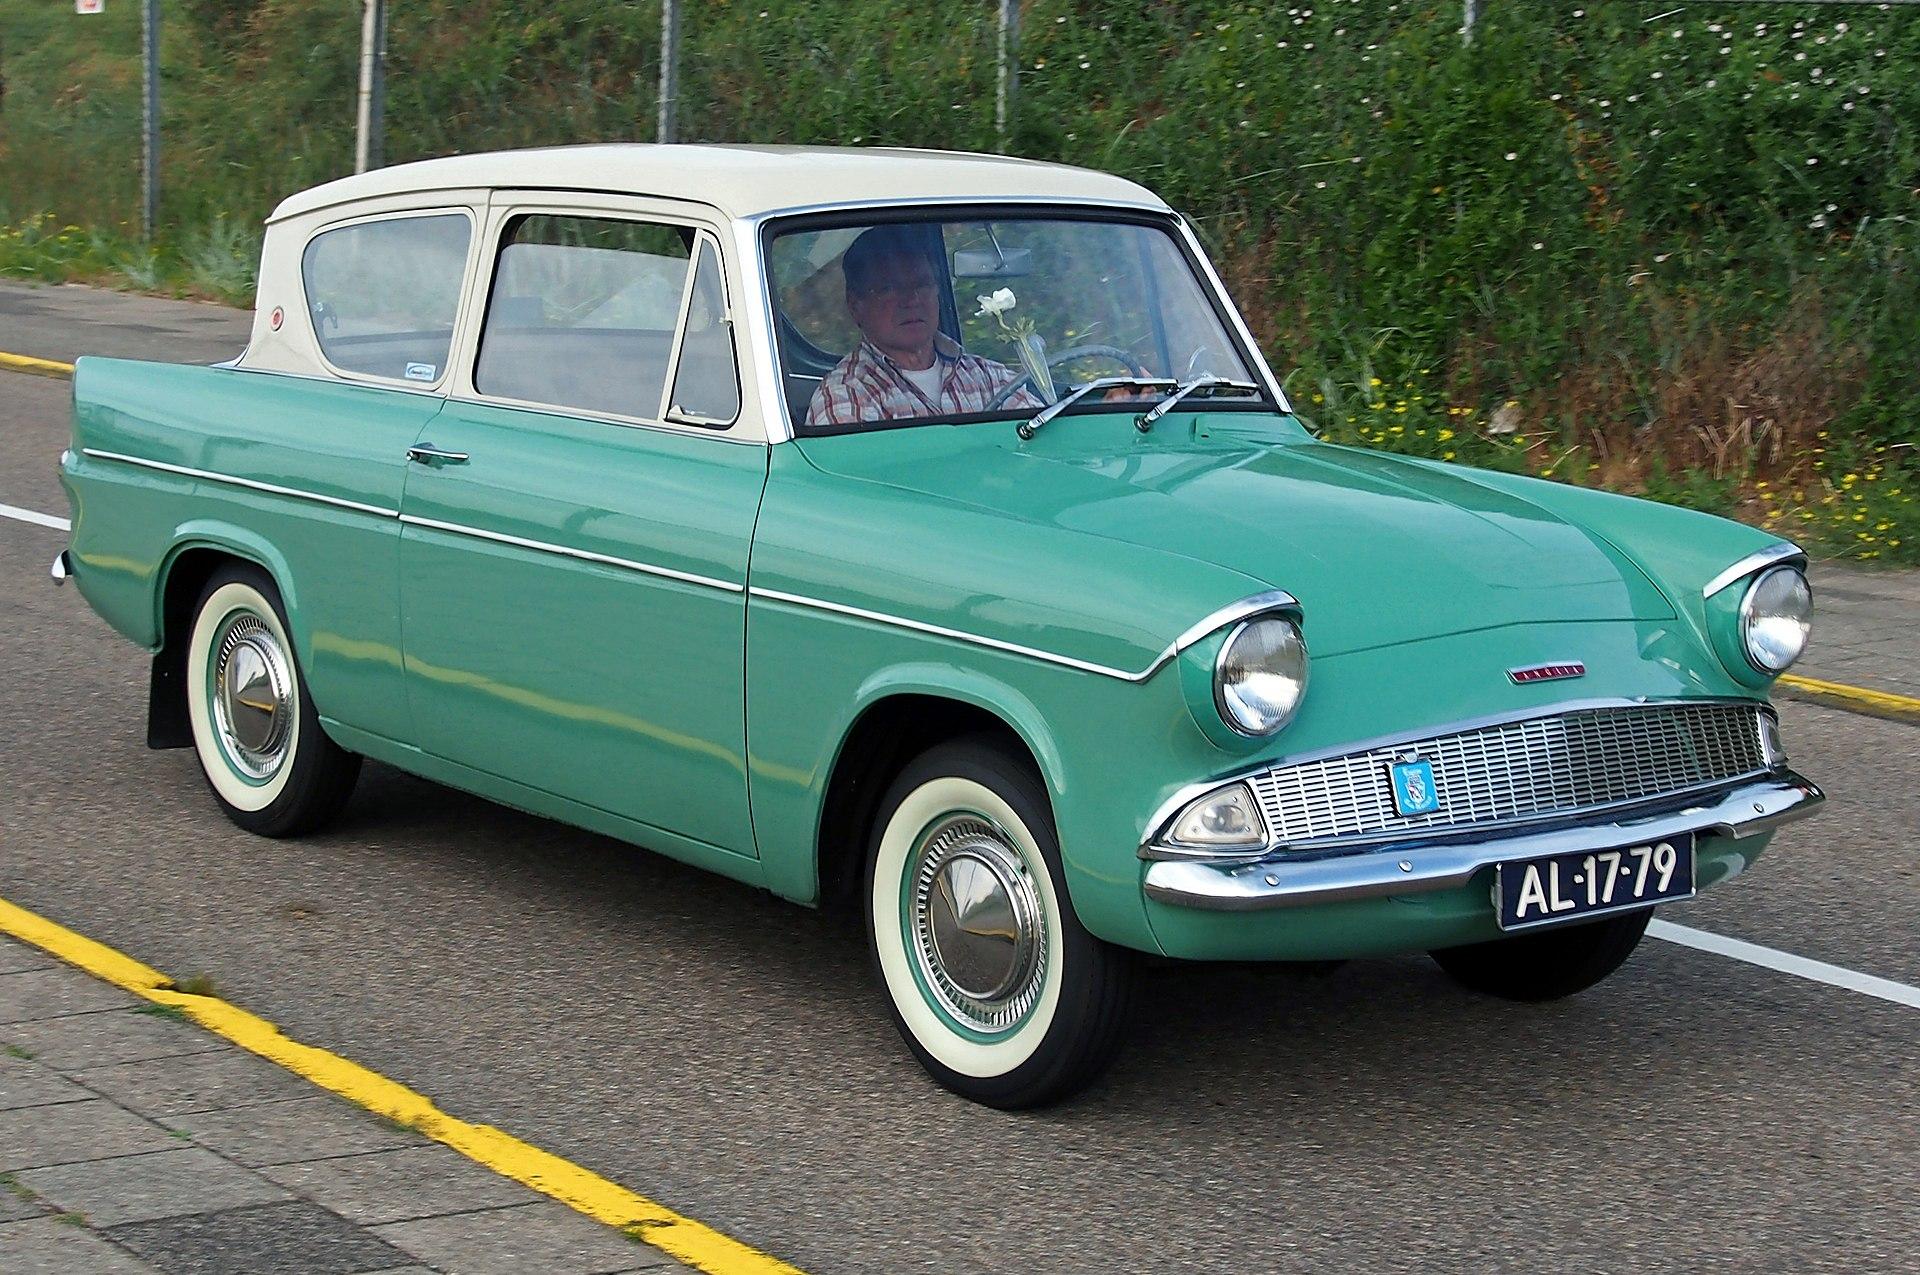 1920px-1960_Ford_105E_Anglia,_licence_AL